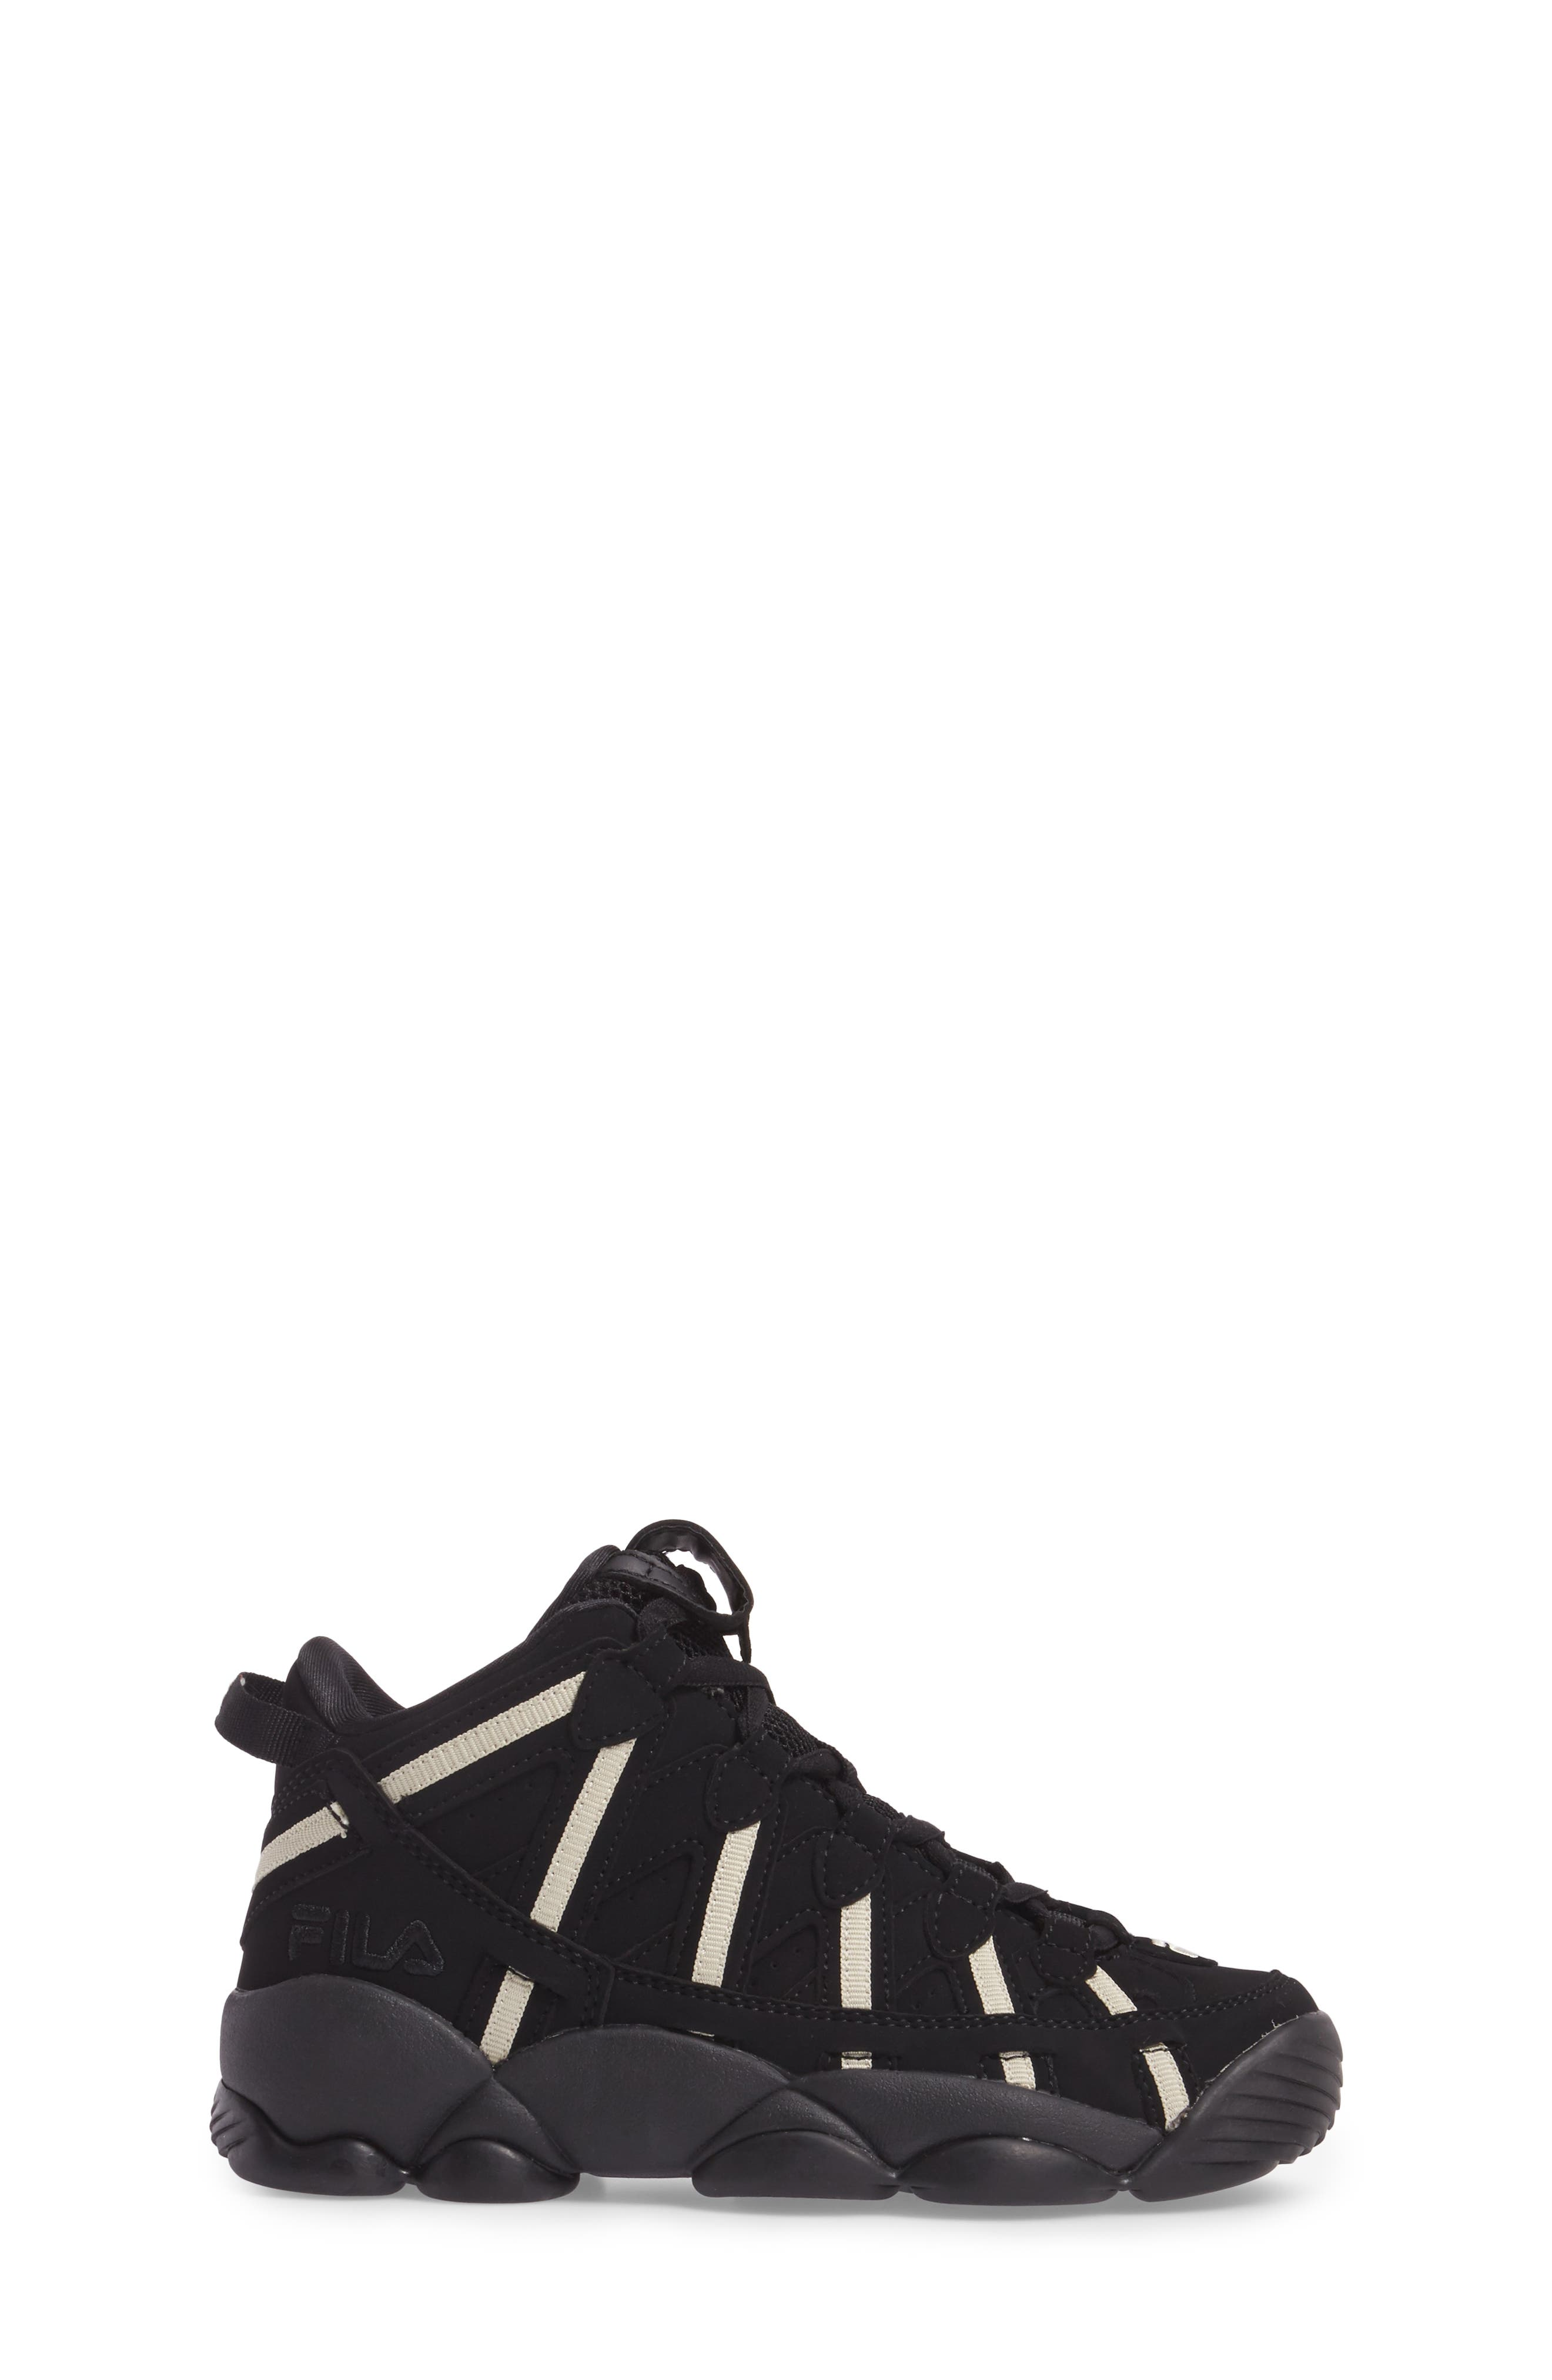 Alternate Image 3  - FILA Spaghetti Deluxe Mid Top Sneaker (Big Kid)